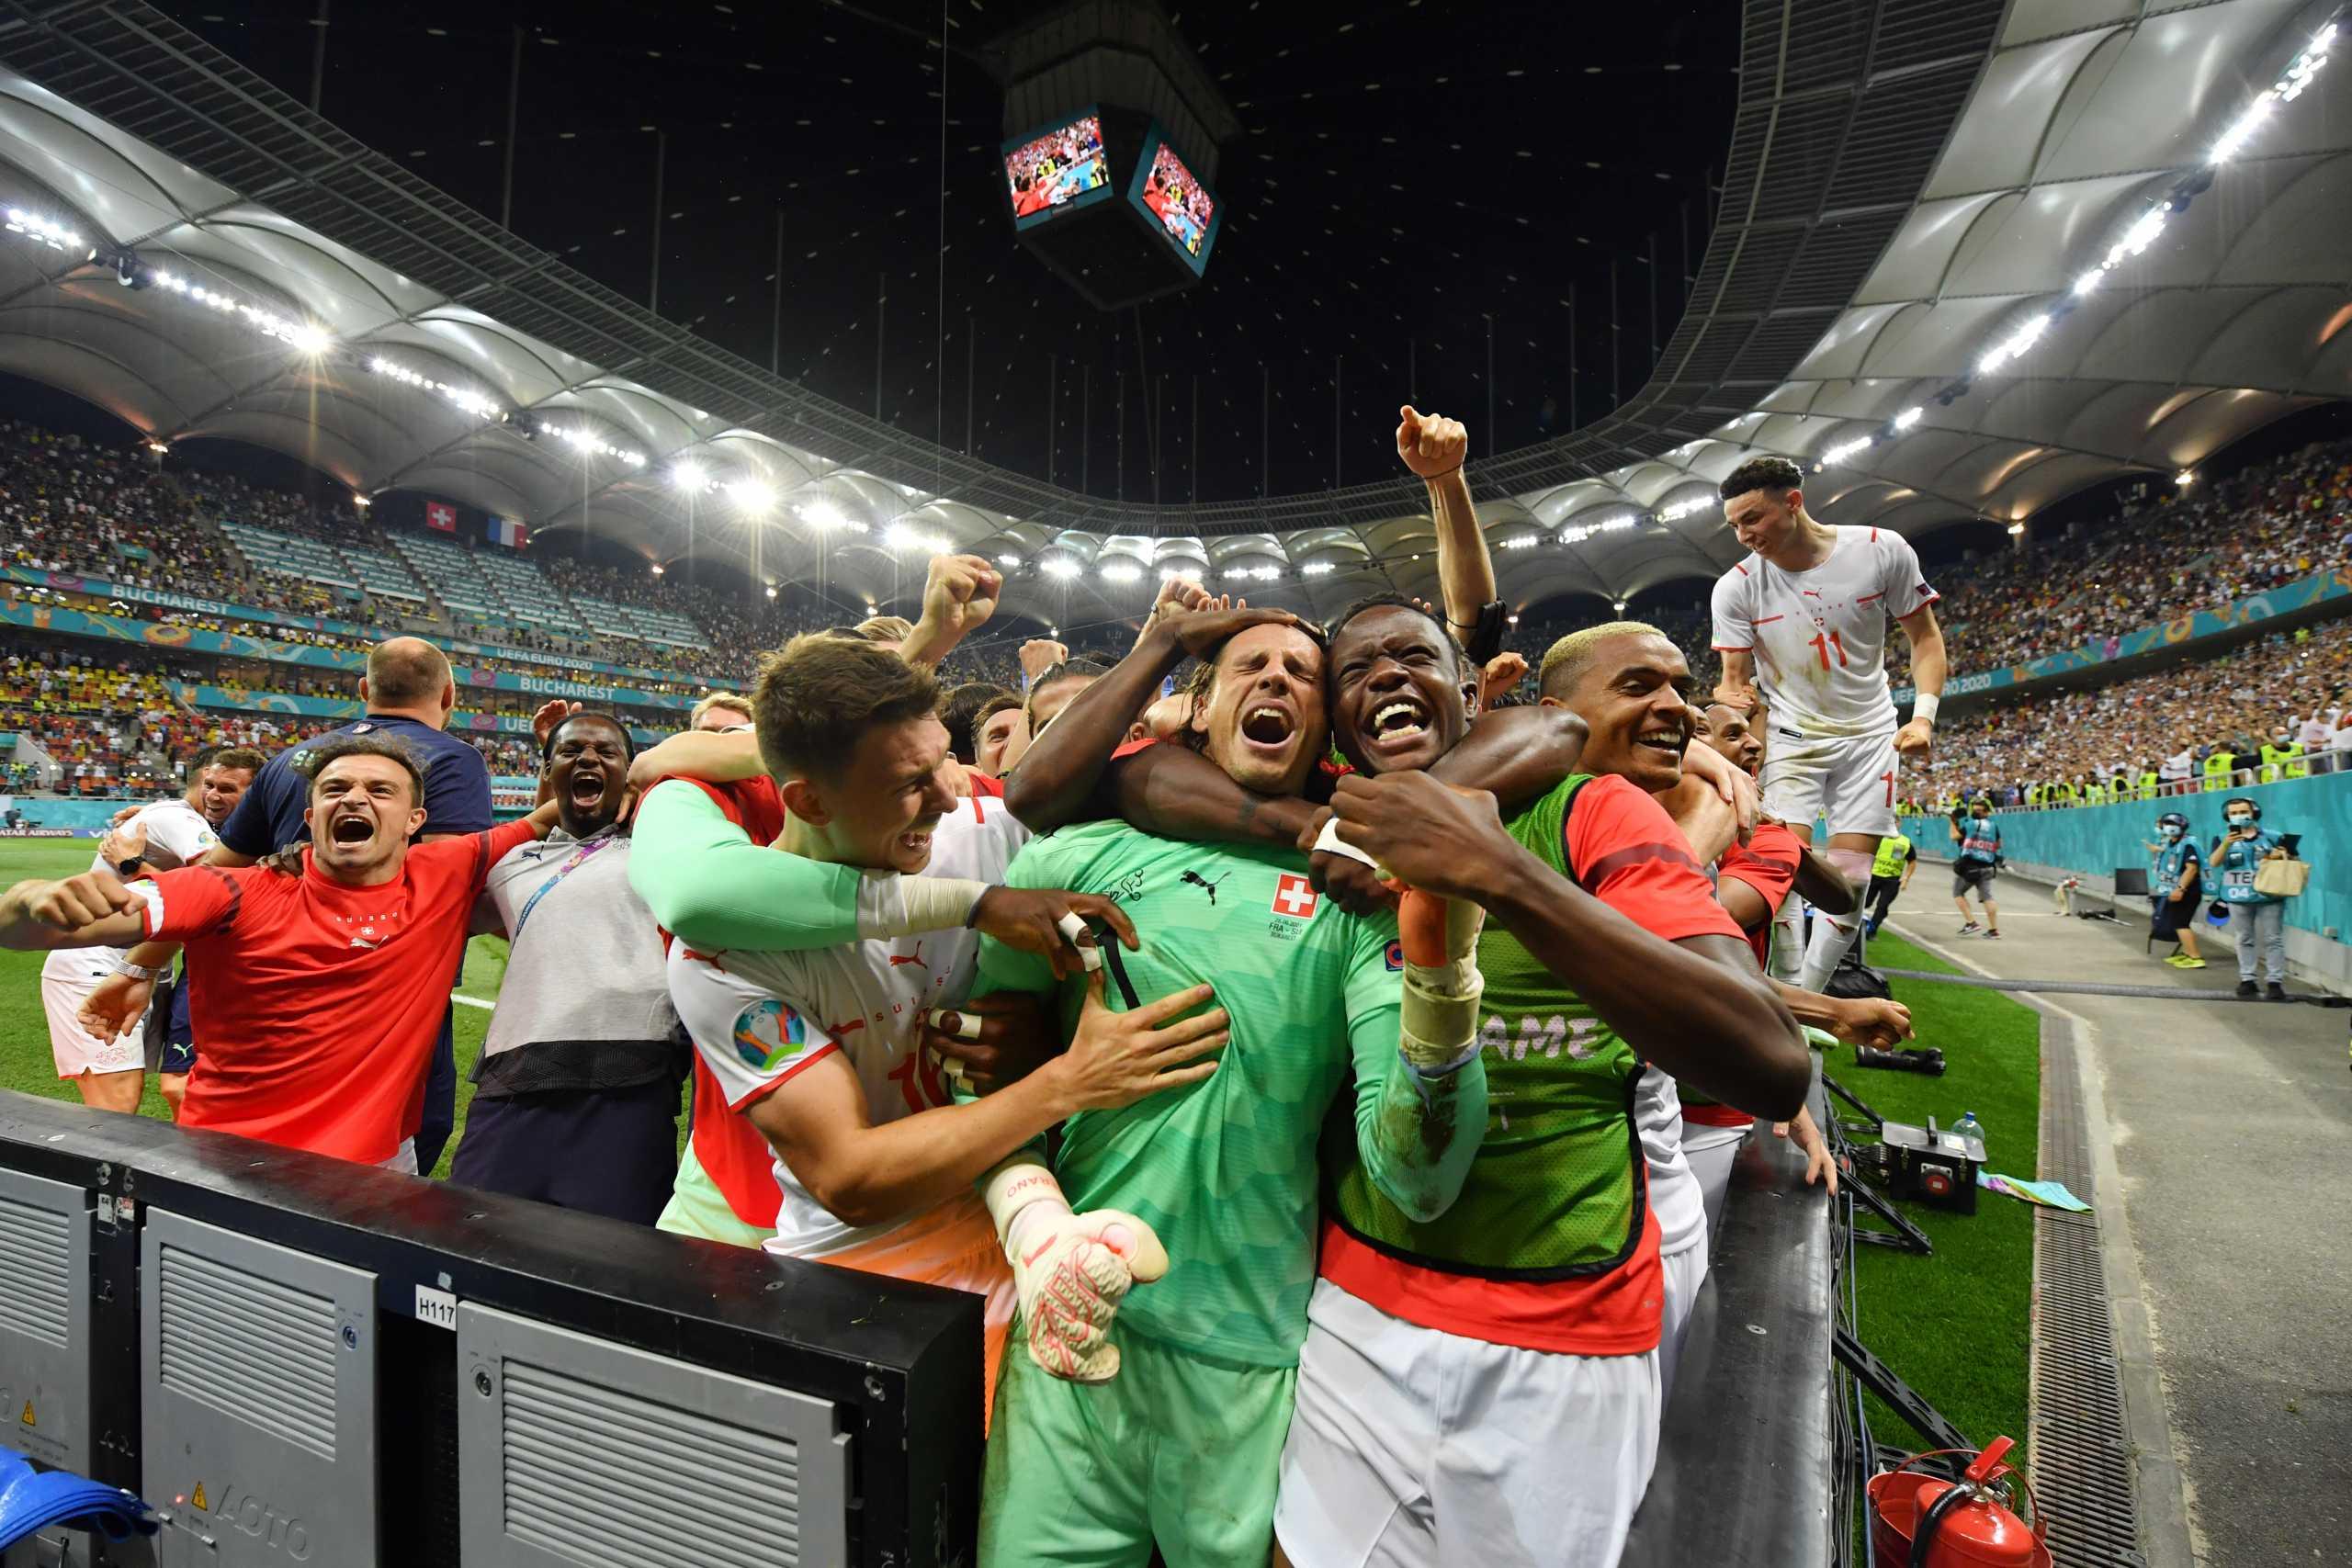 Euro 2020, Γαλλία – Ελβετία: Έξαλλοι πανηγυρισμοί για τους θριαμβευτές με τον κόσμο